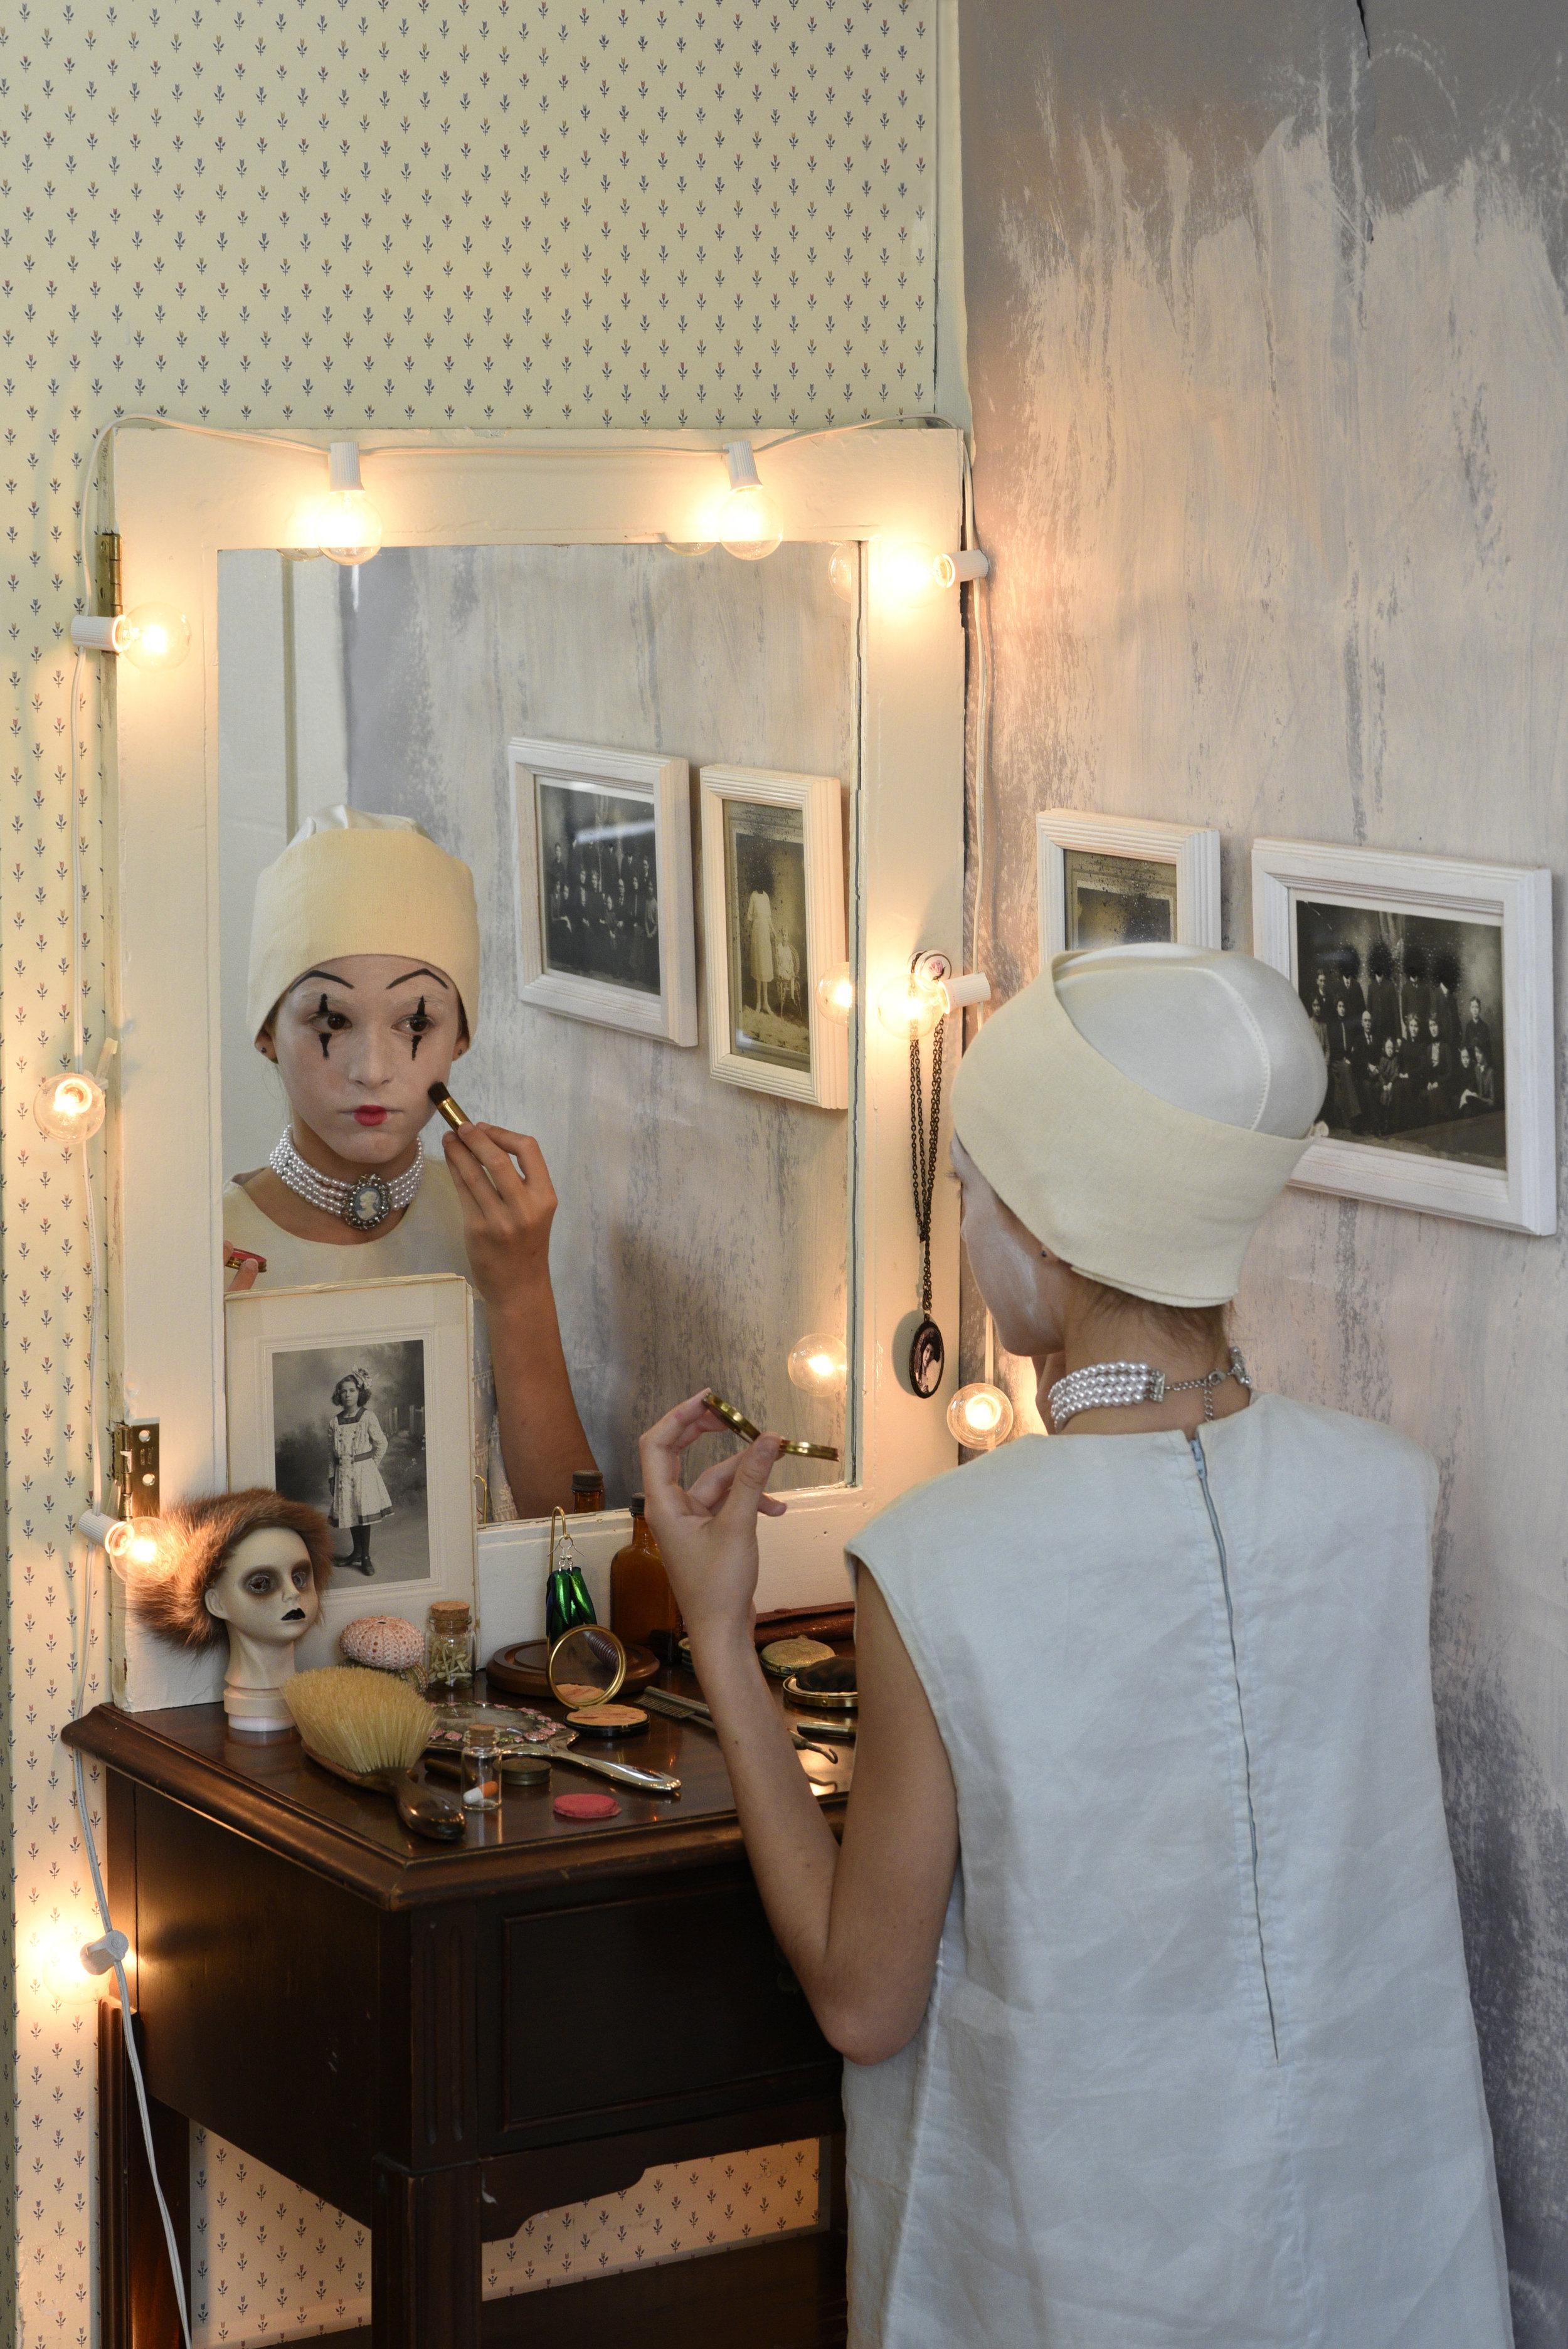 makeupmirror.jpg